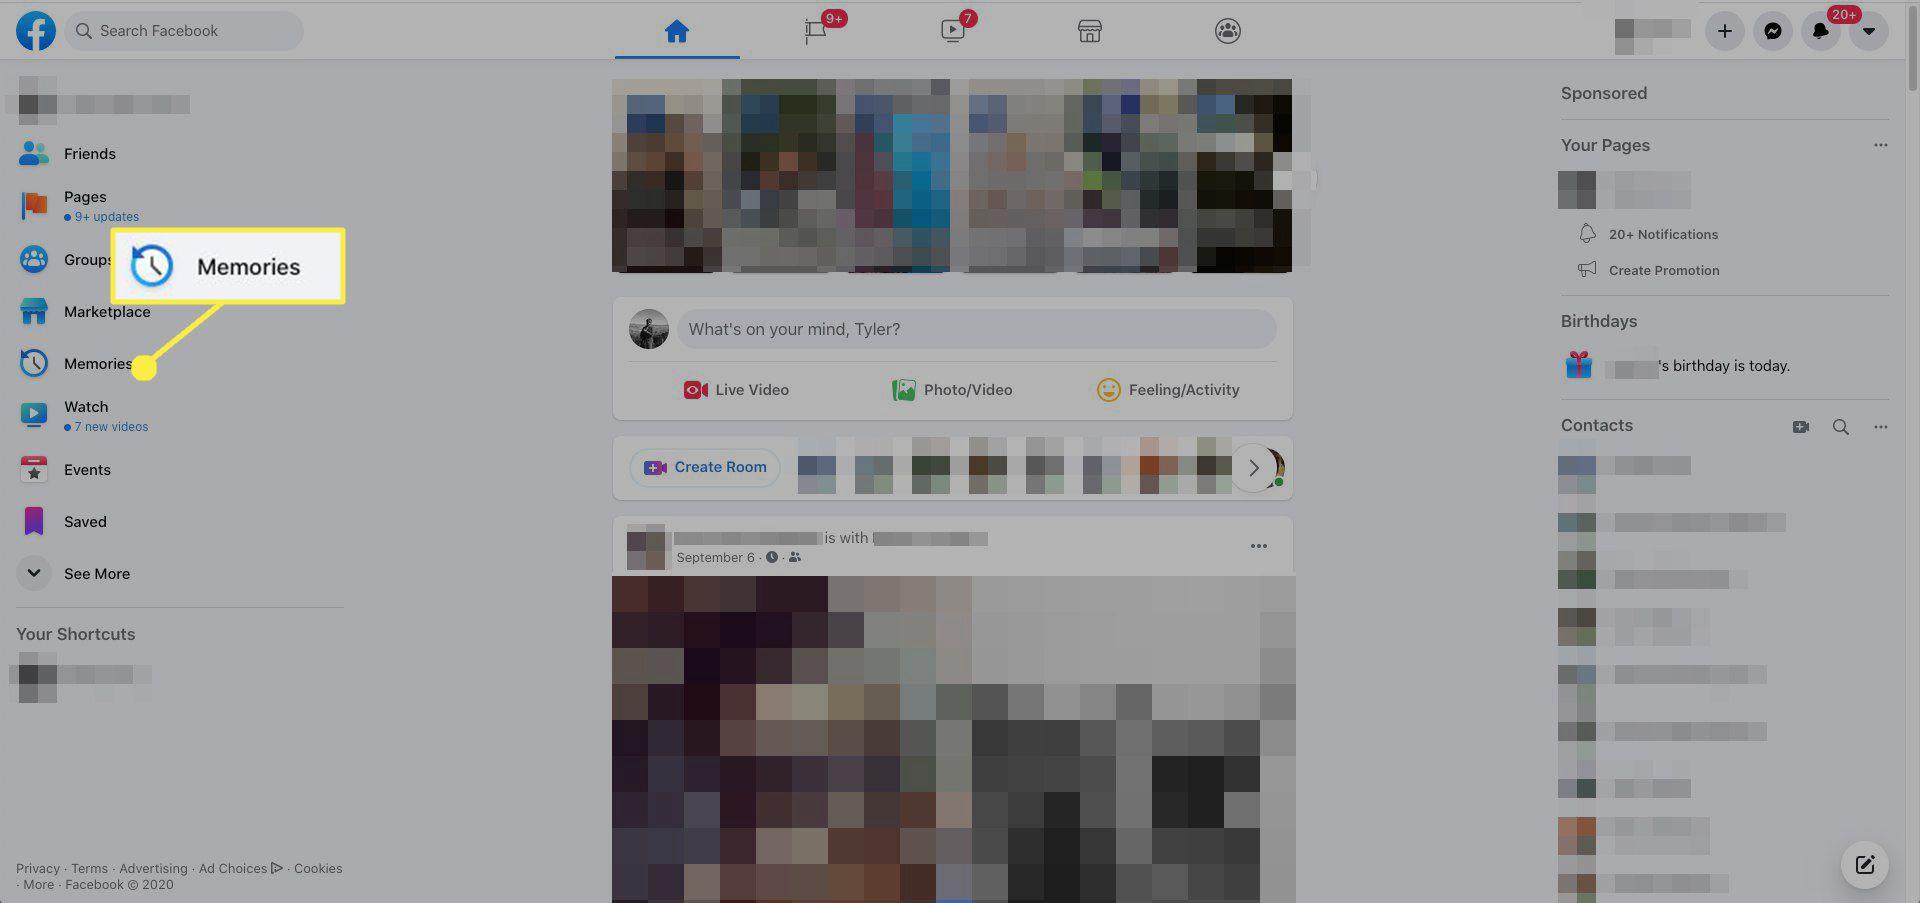 In Facebook, select Memories from the left menu